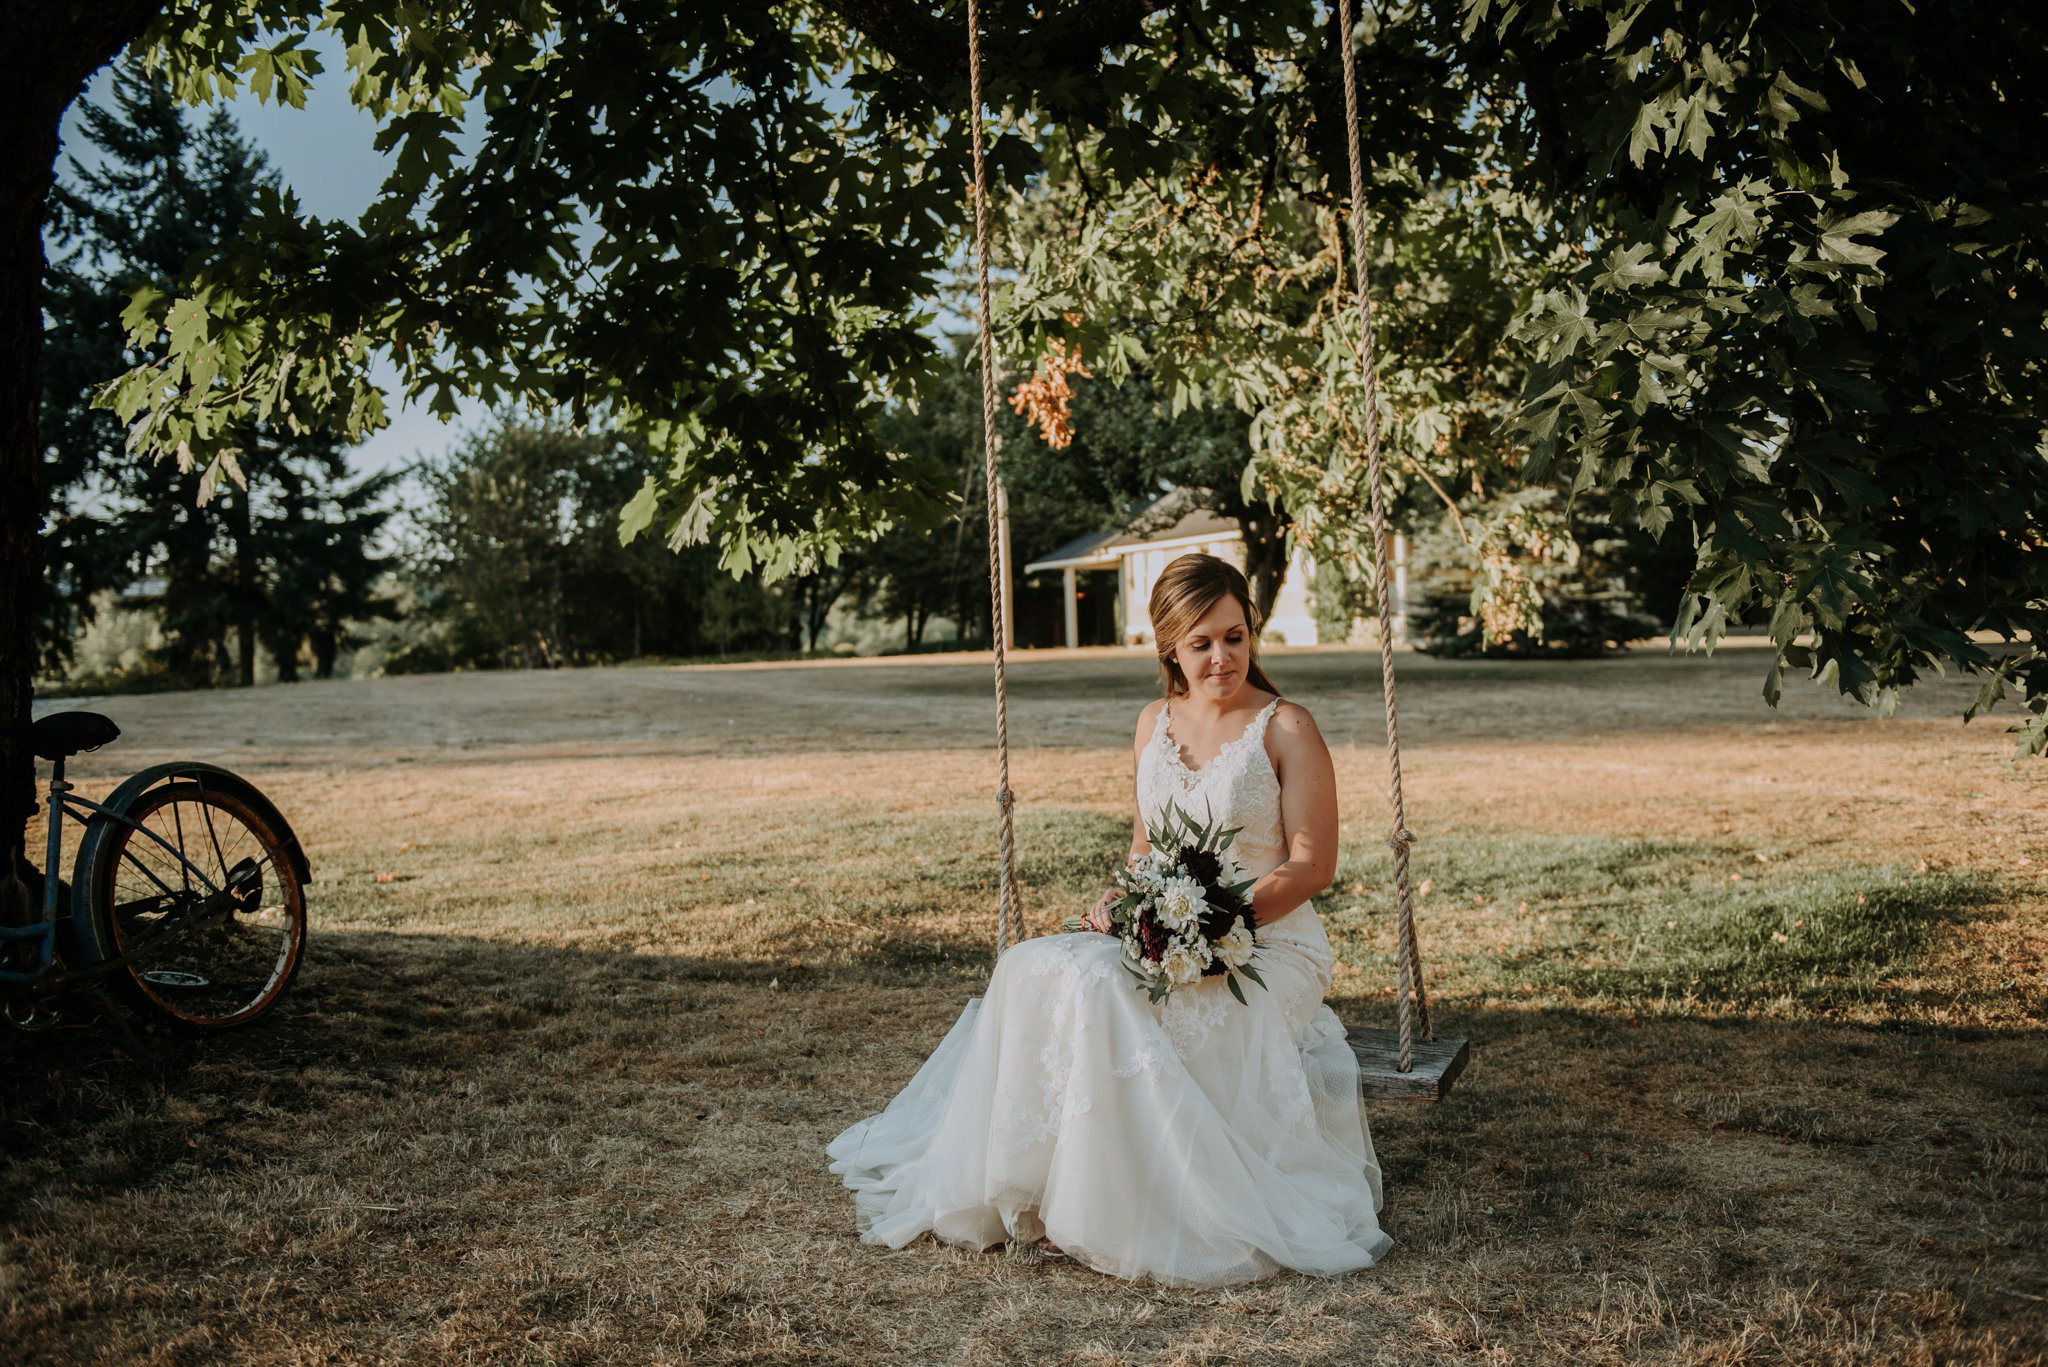 kristen-and-cody-the-kelley-farm-wedding-seattle-photographer-caitlyn-nikula-87.jpg